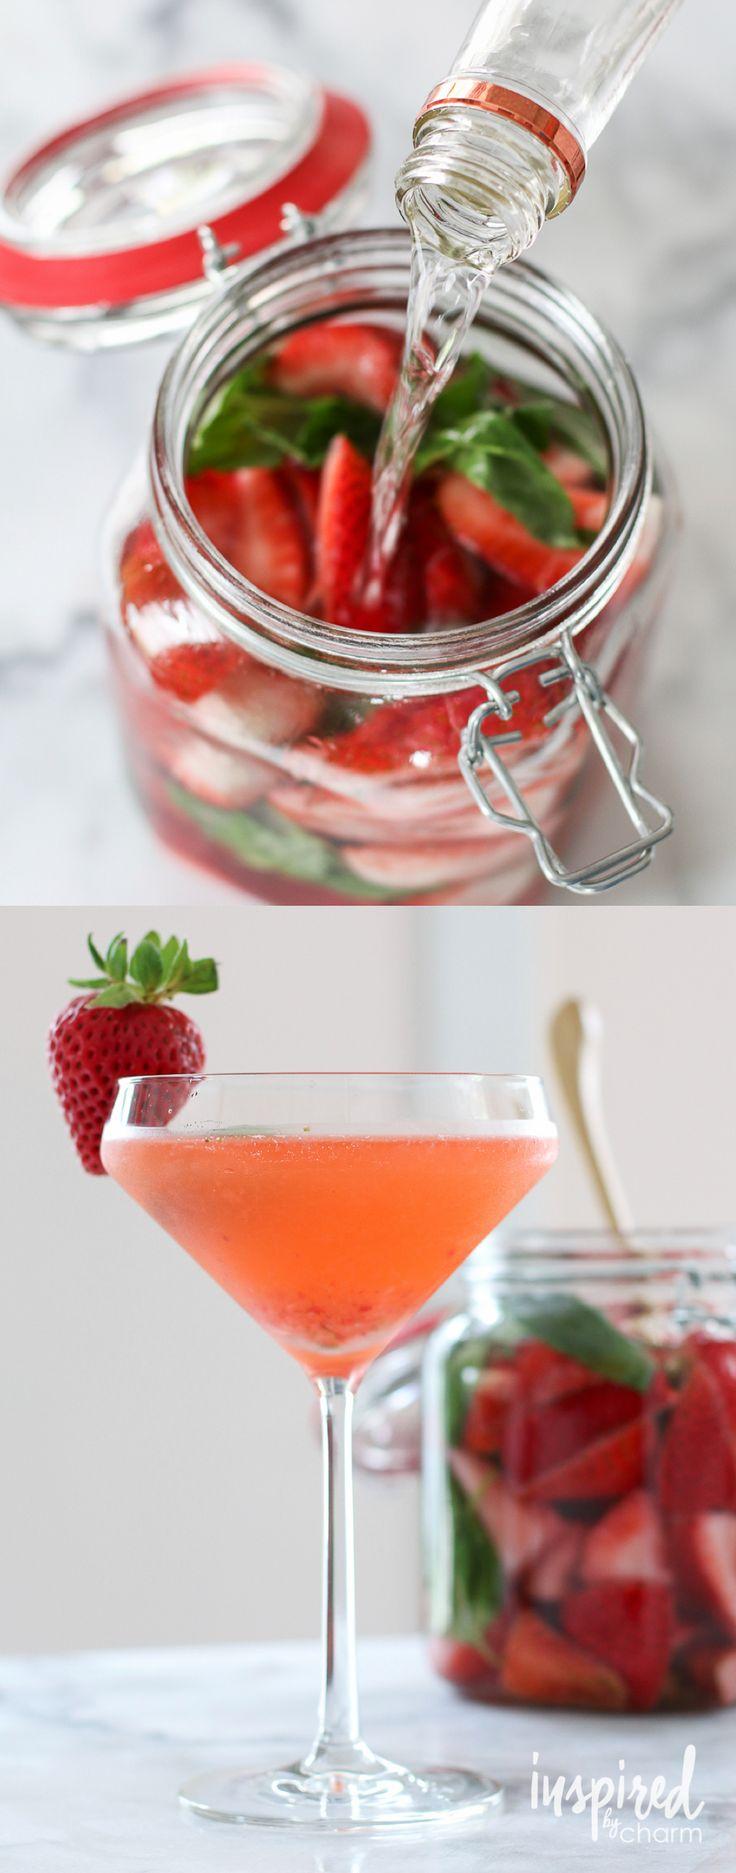 Strawberry Basil Martini - made with homemade Strawberry Basil Vodka!